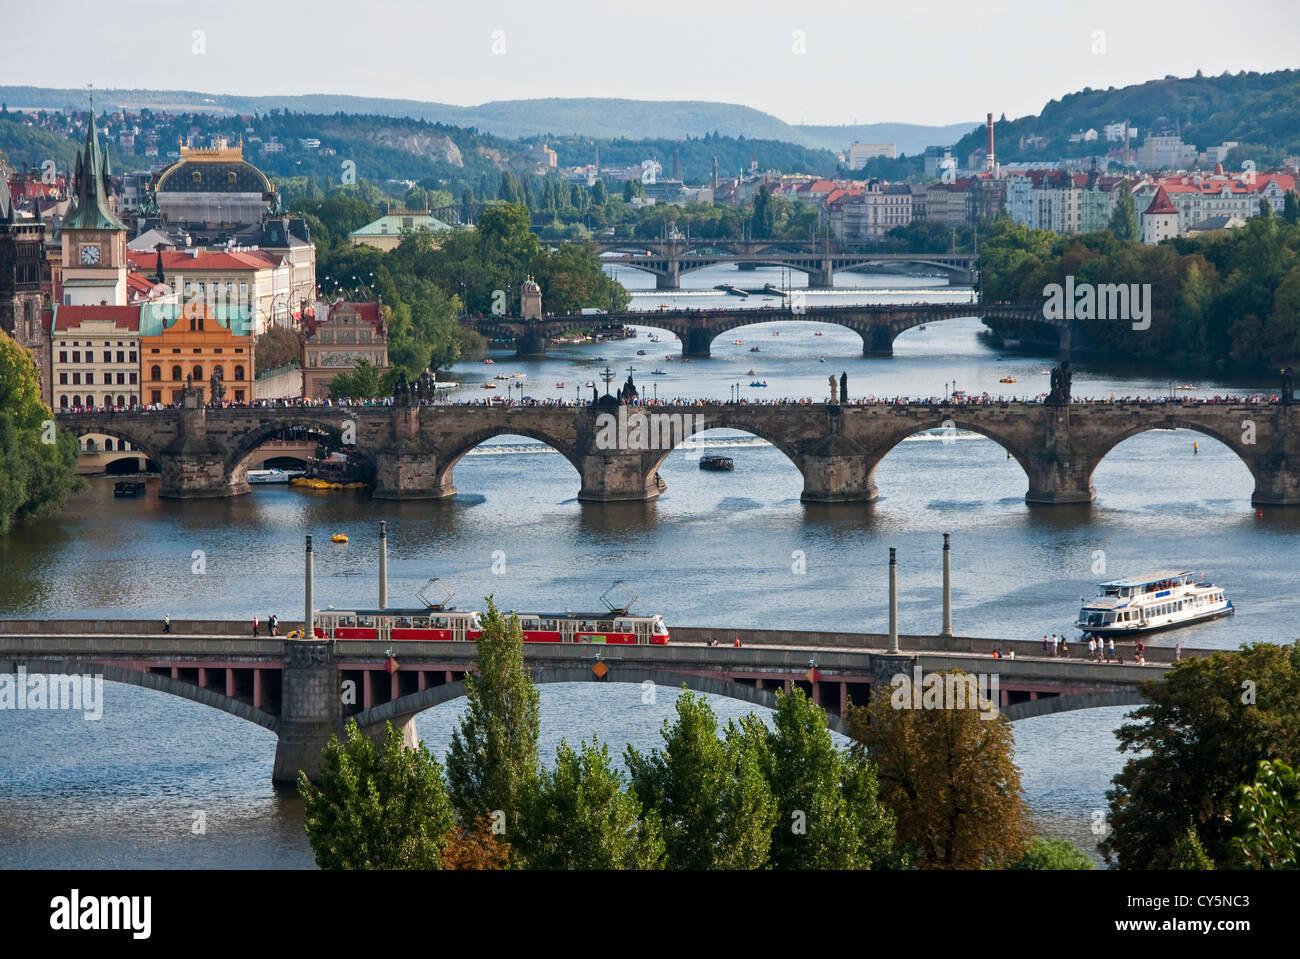 5 of the 18 bridges over the Vltava River in Prague - Stock Image